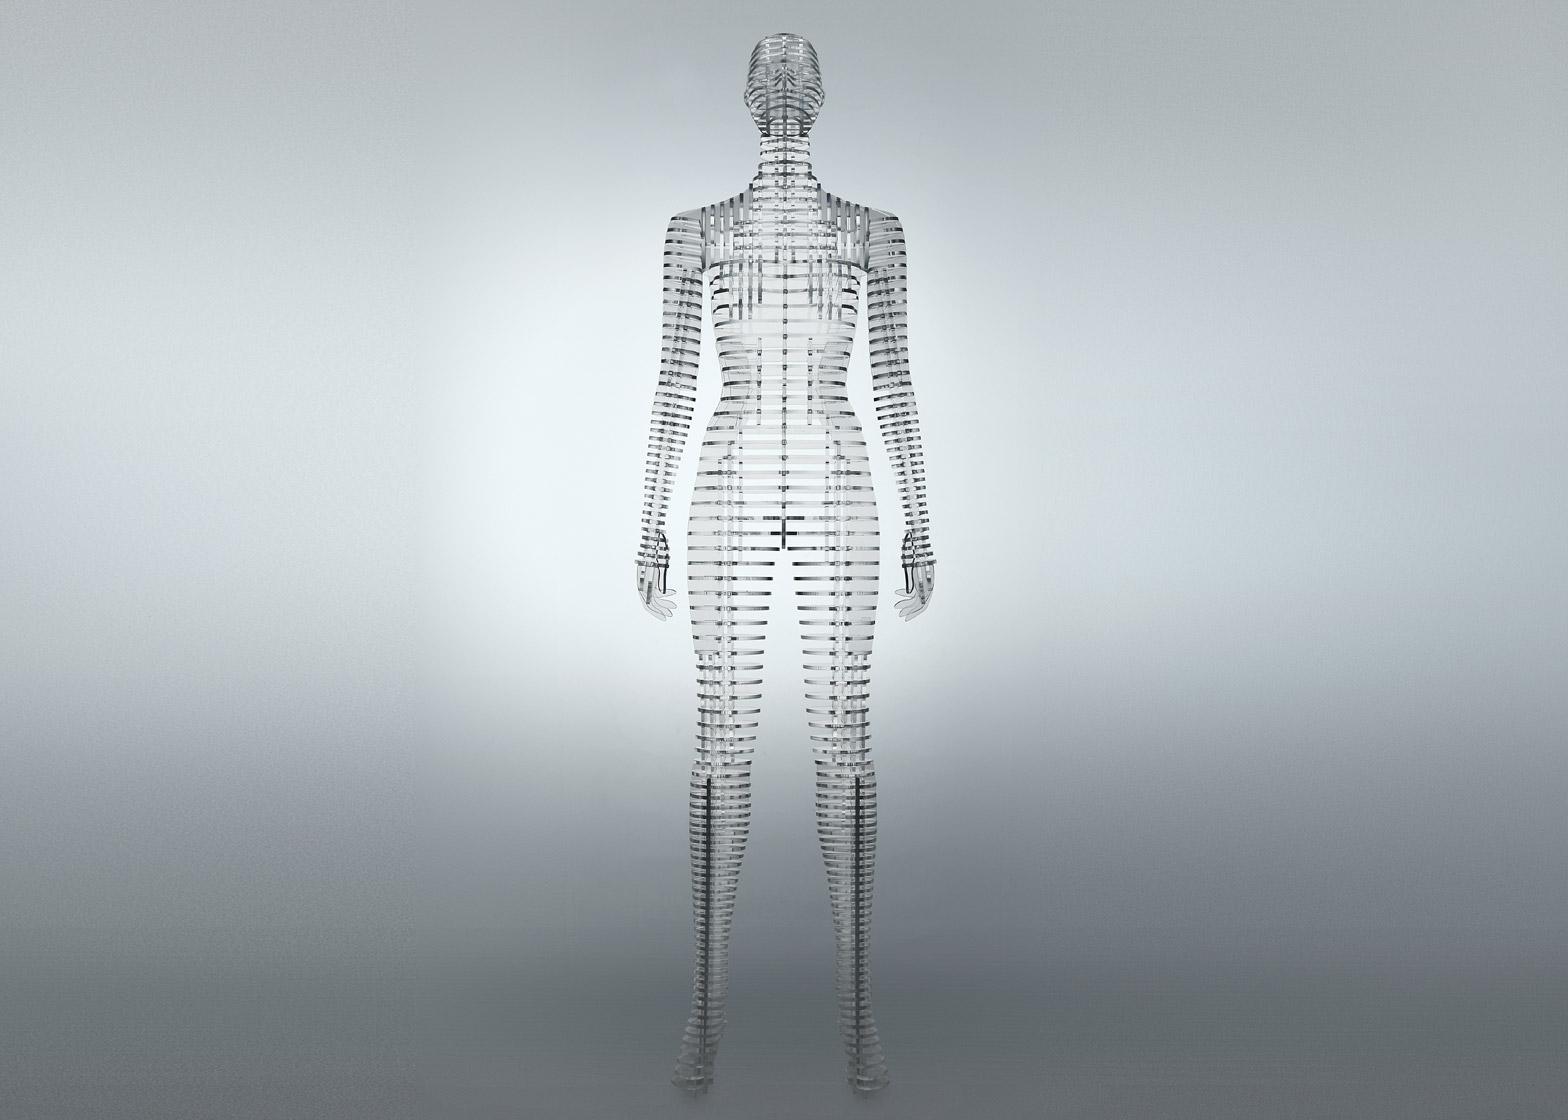 transparent-body-installation-tokujin-yoshioka-issey-miyake-exhibition-tokyp-japan_dezeen_1568_10.jpg